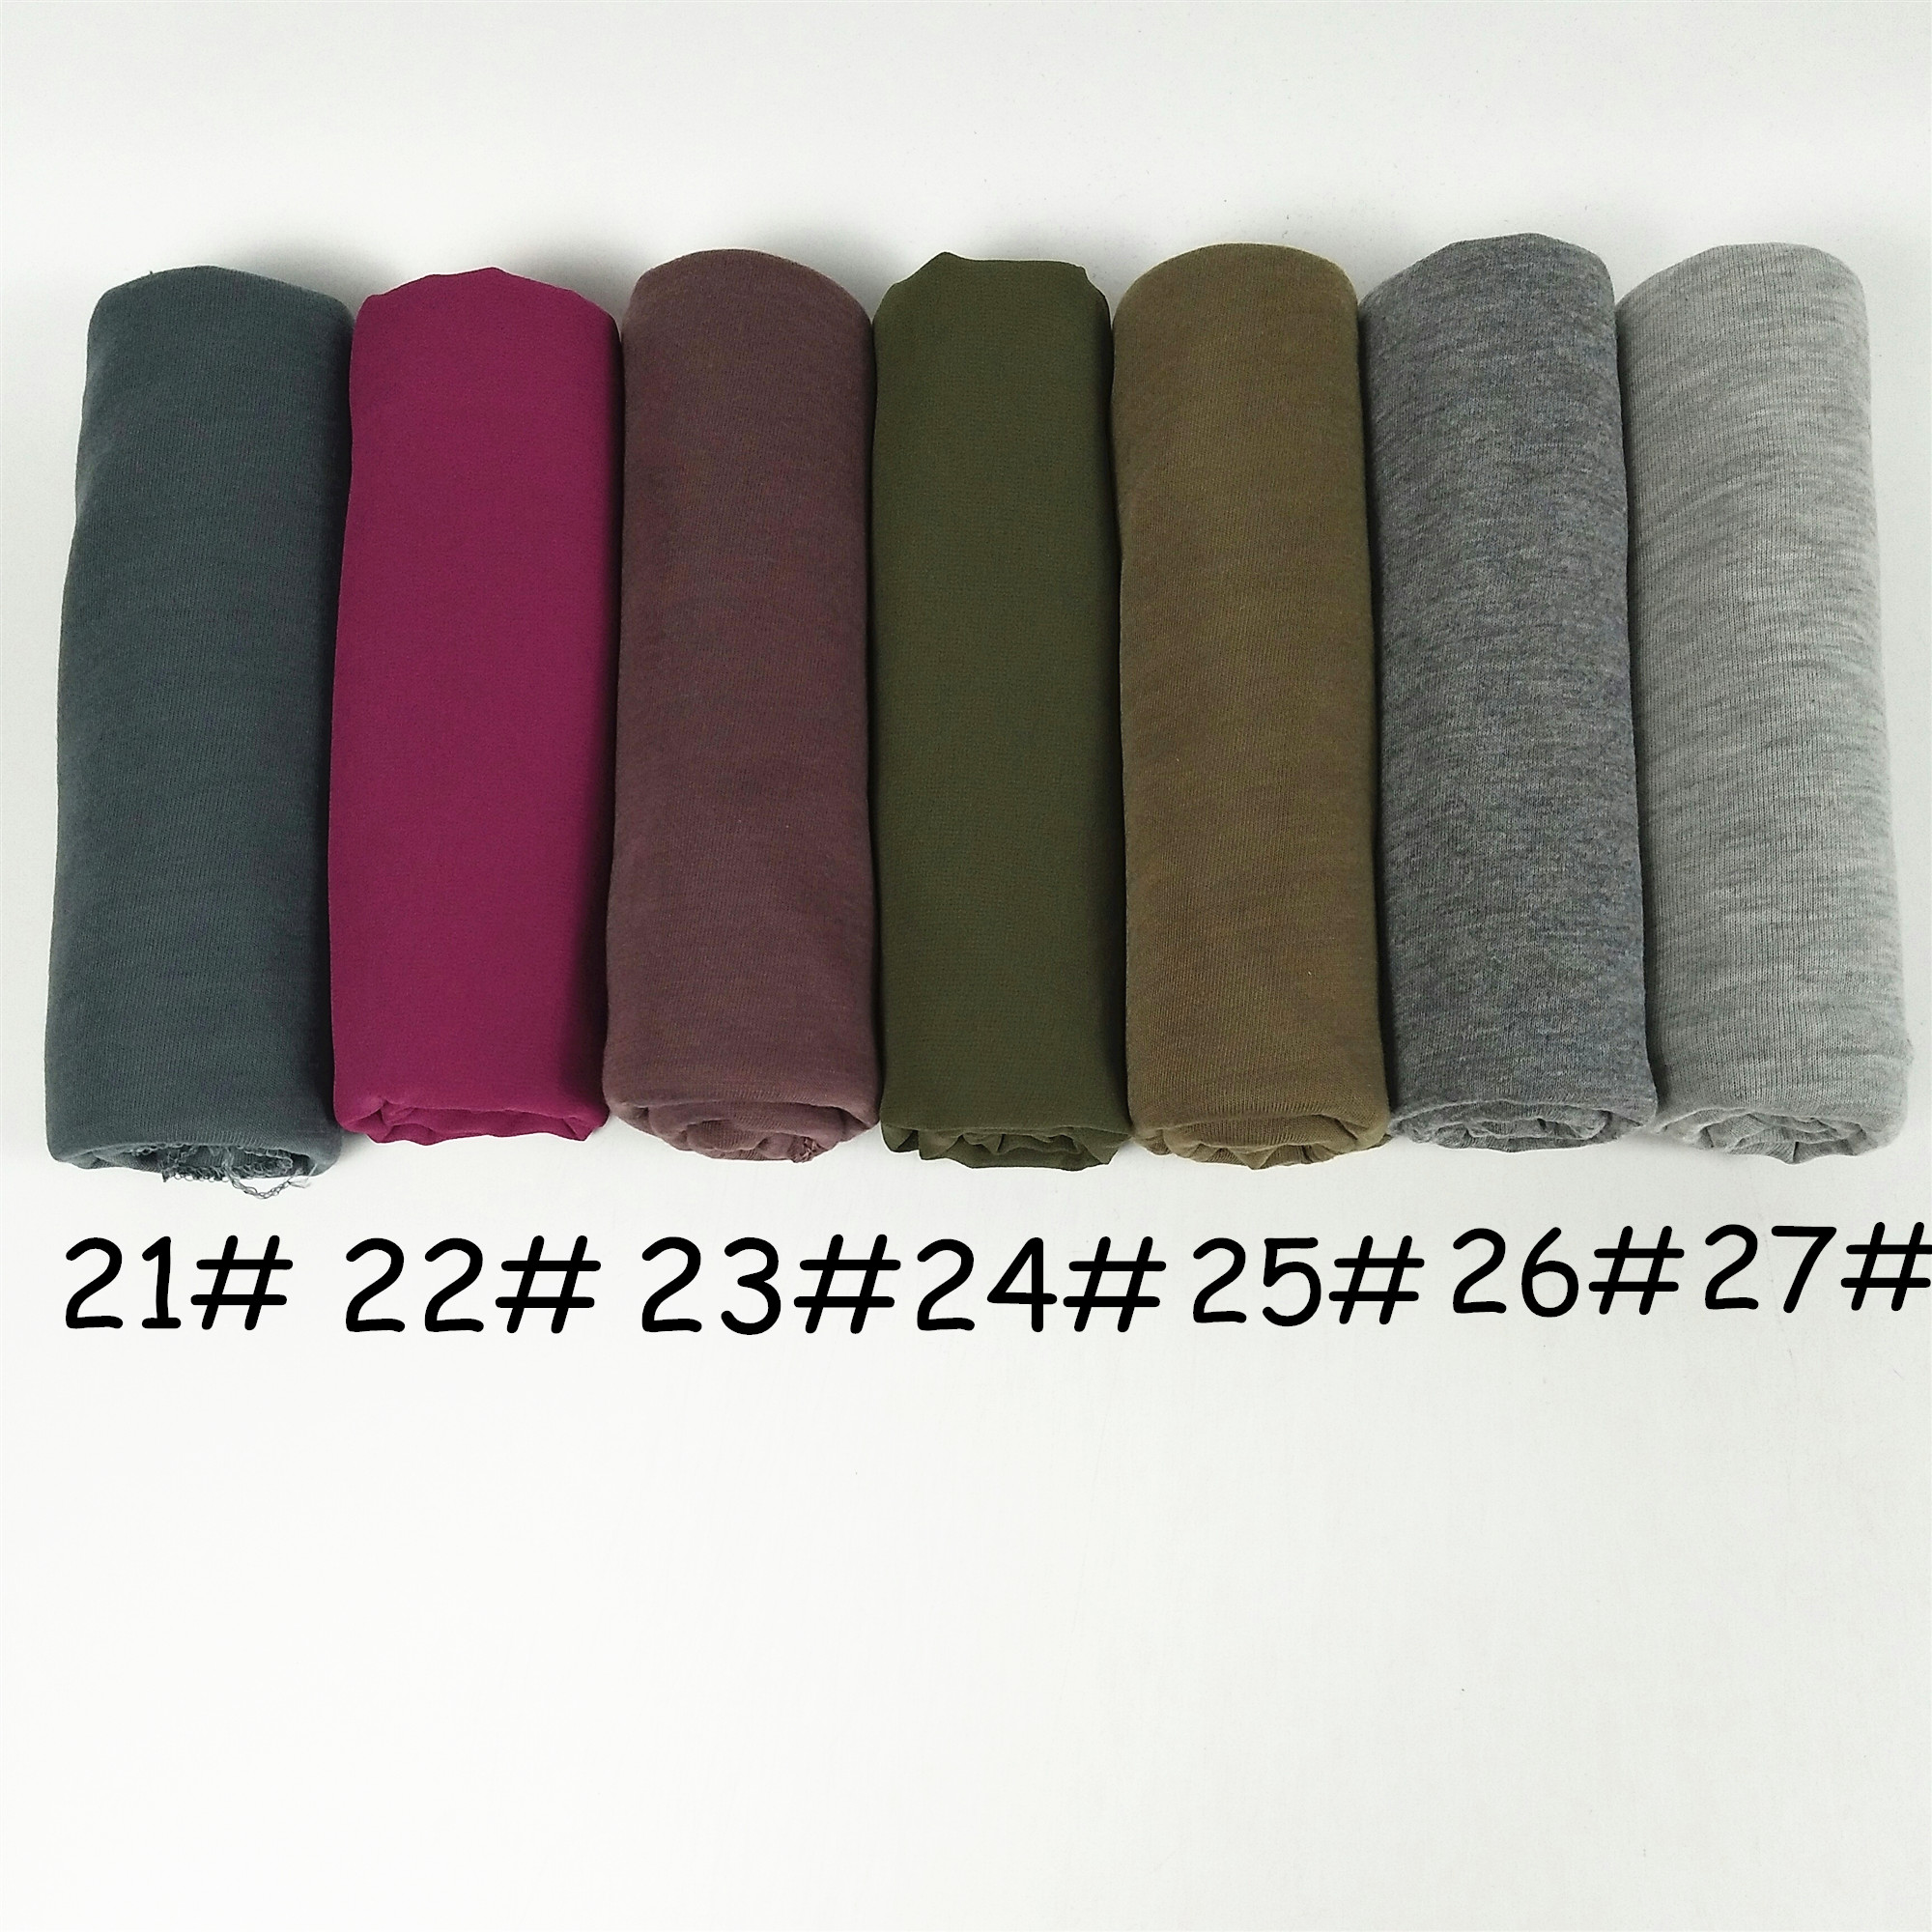 31color High Quality Jersey Scarf Cotton Plain Elasticity Shawls Maxi Hijab Long Muslim Head Wrap Long Scarves/scarf 10pcs/lot